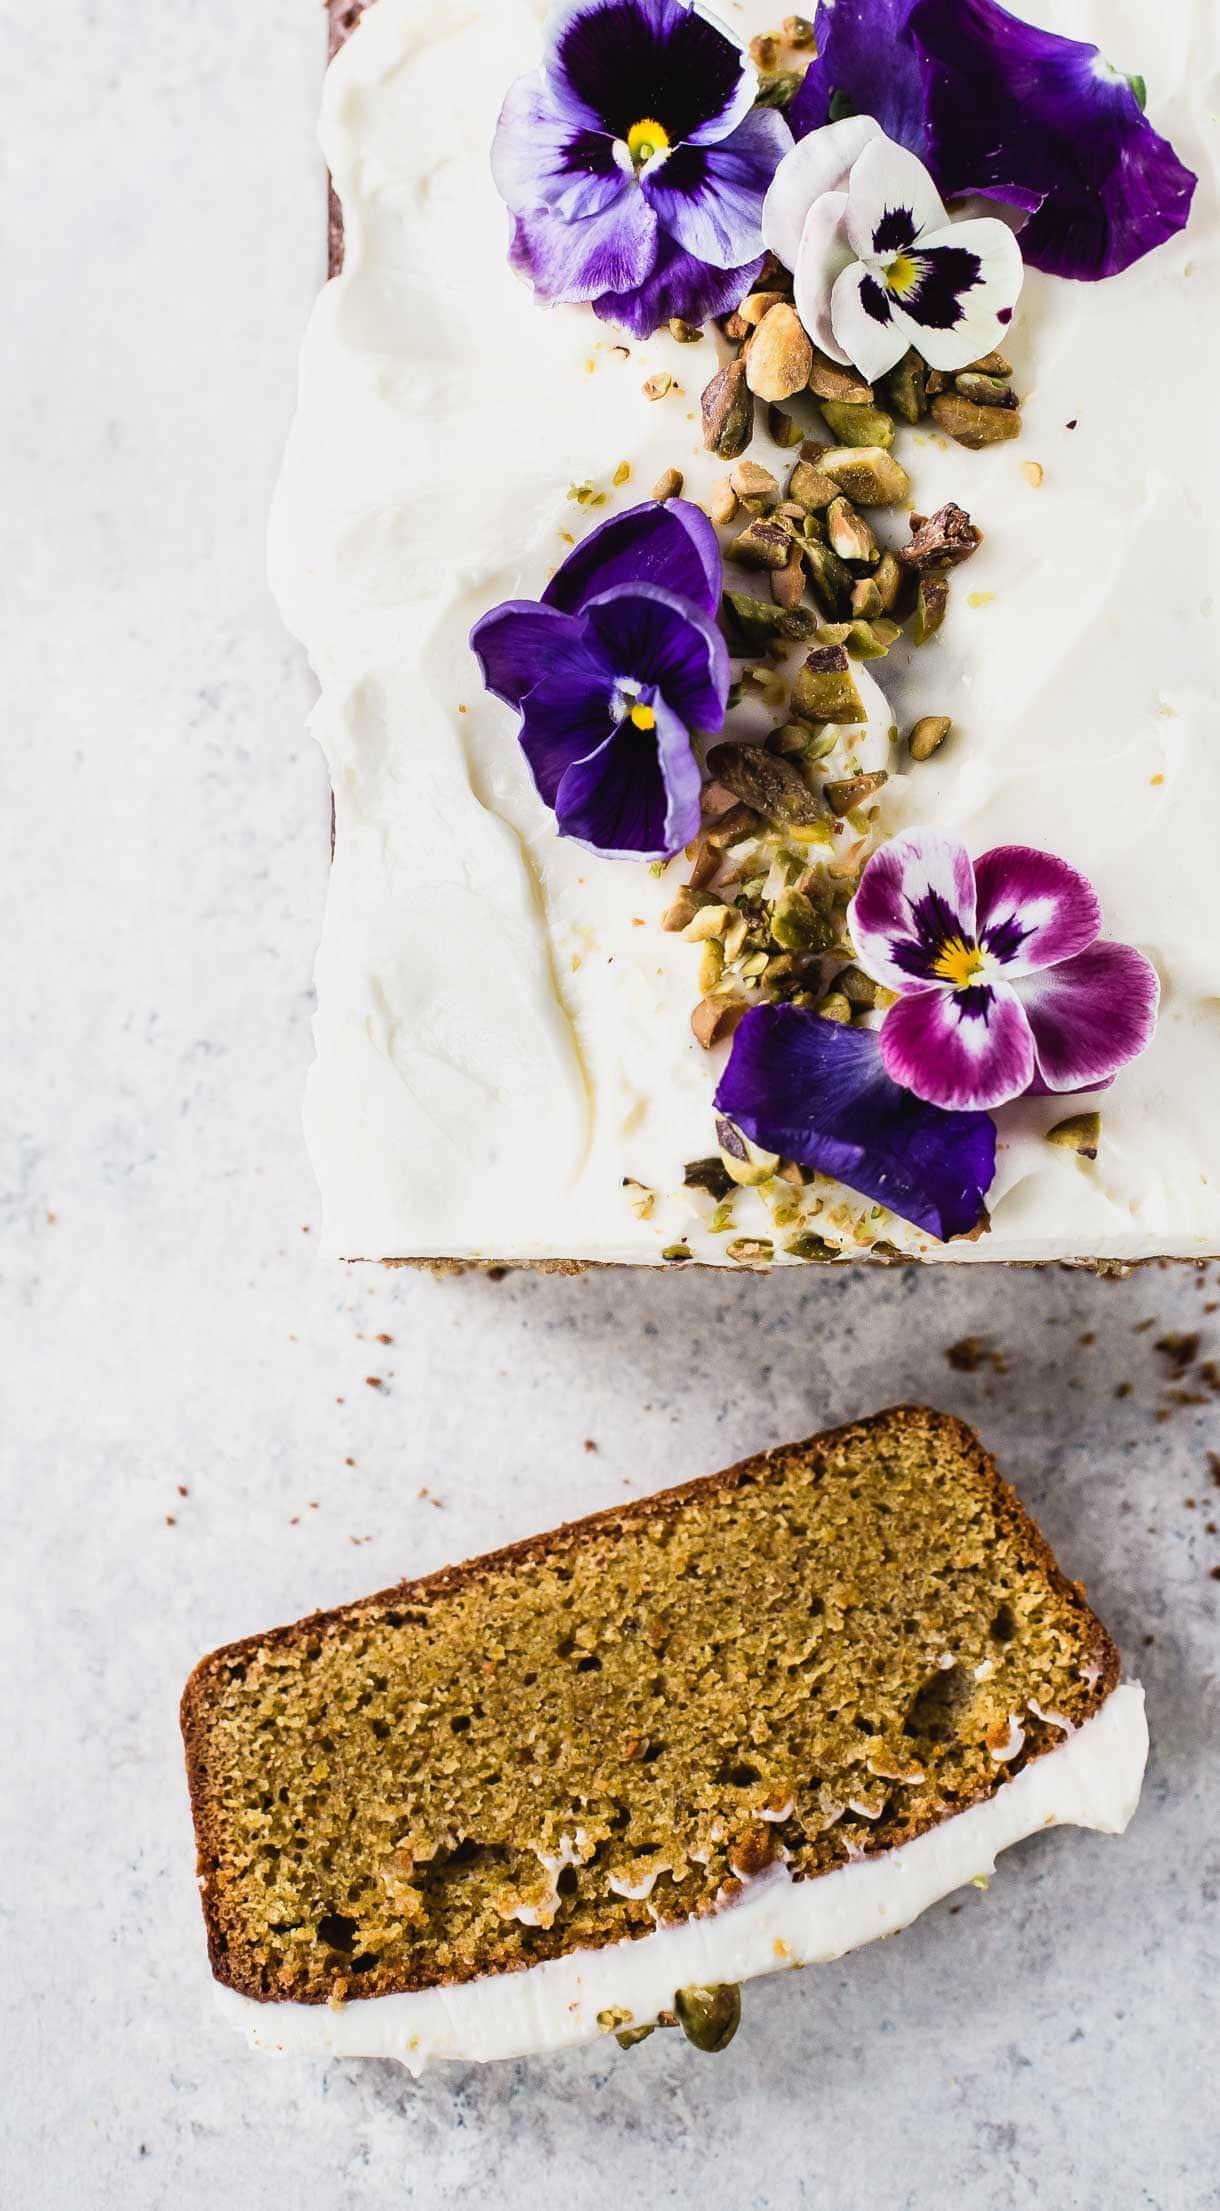 Teff Flour Cardamom Pistachio Cake with Cream Cheese Frosting {gluten-free}